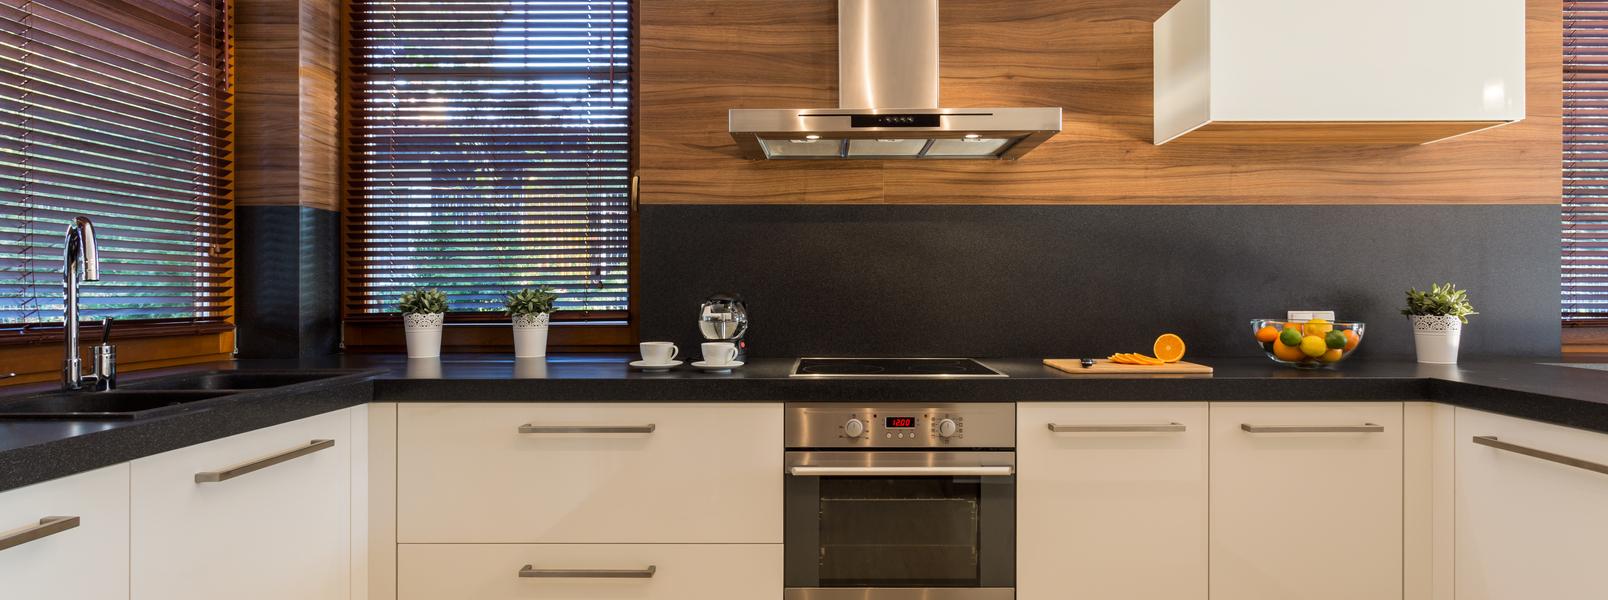 10 Kitchen Renovation Mistakes to Avoid